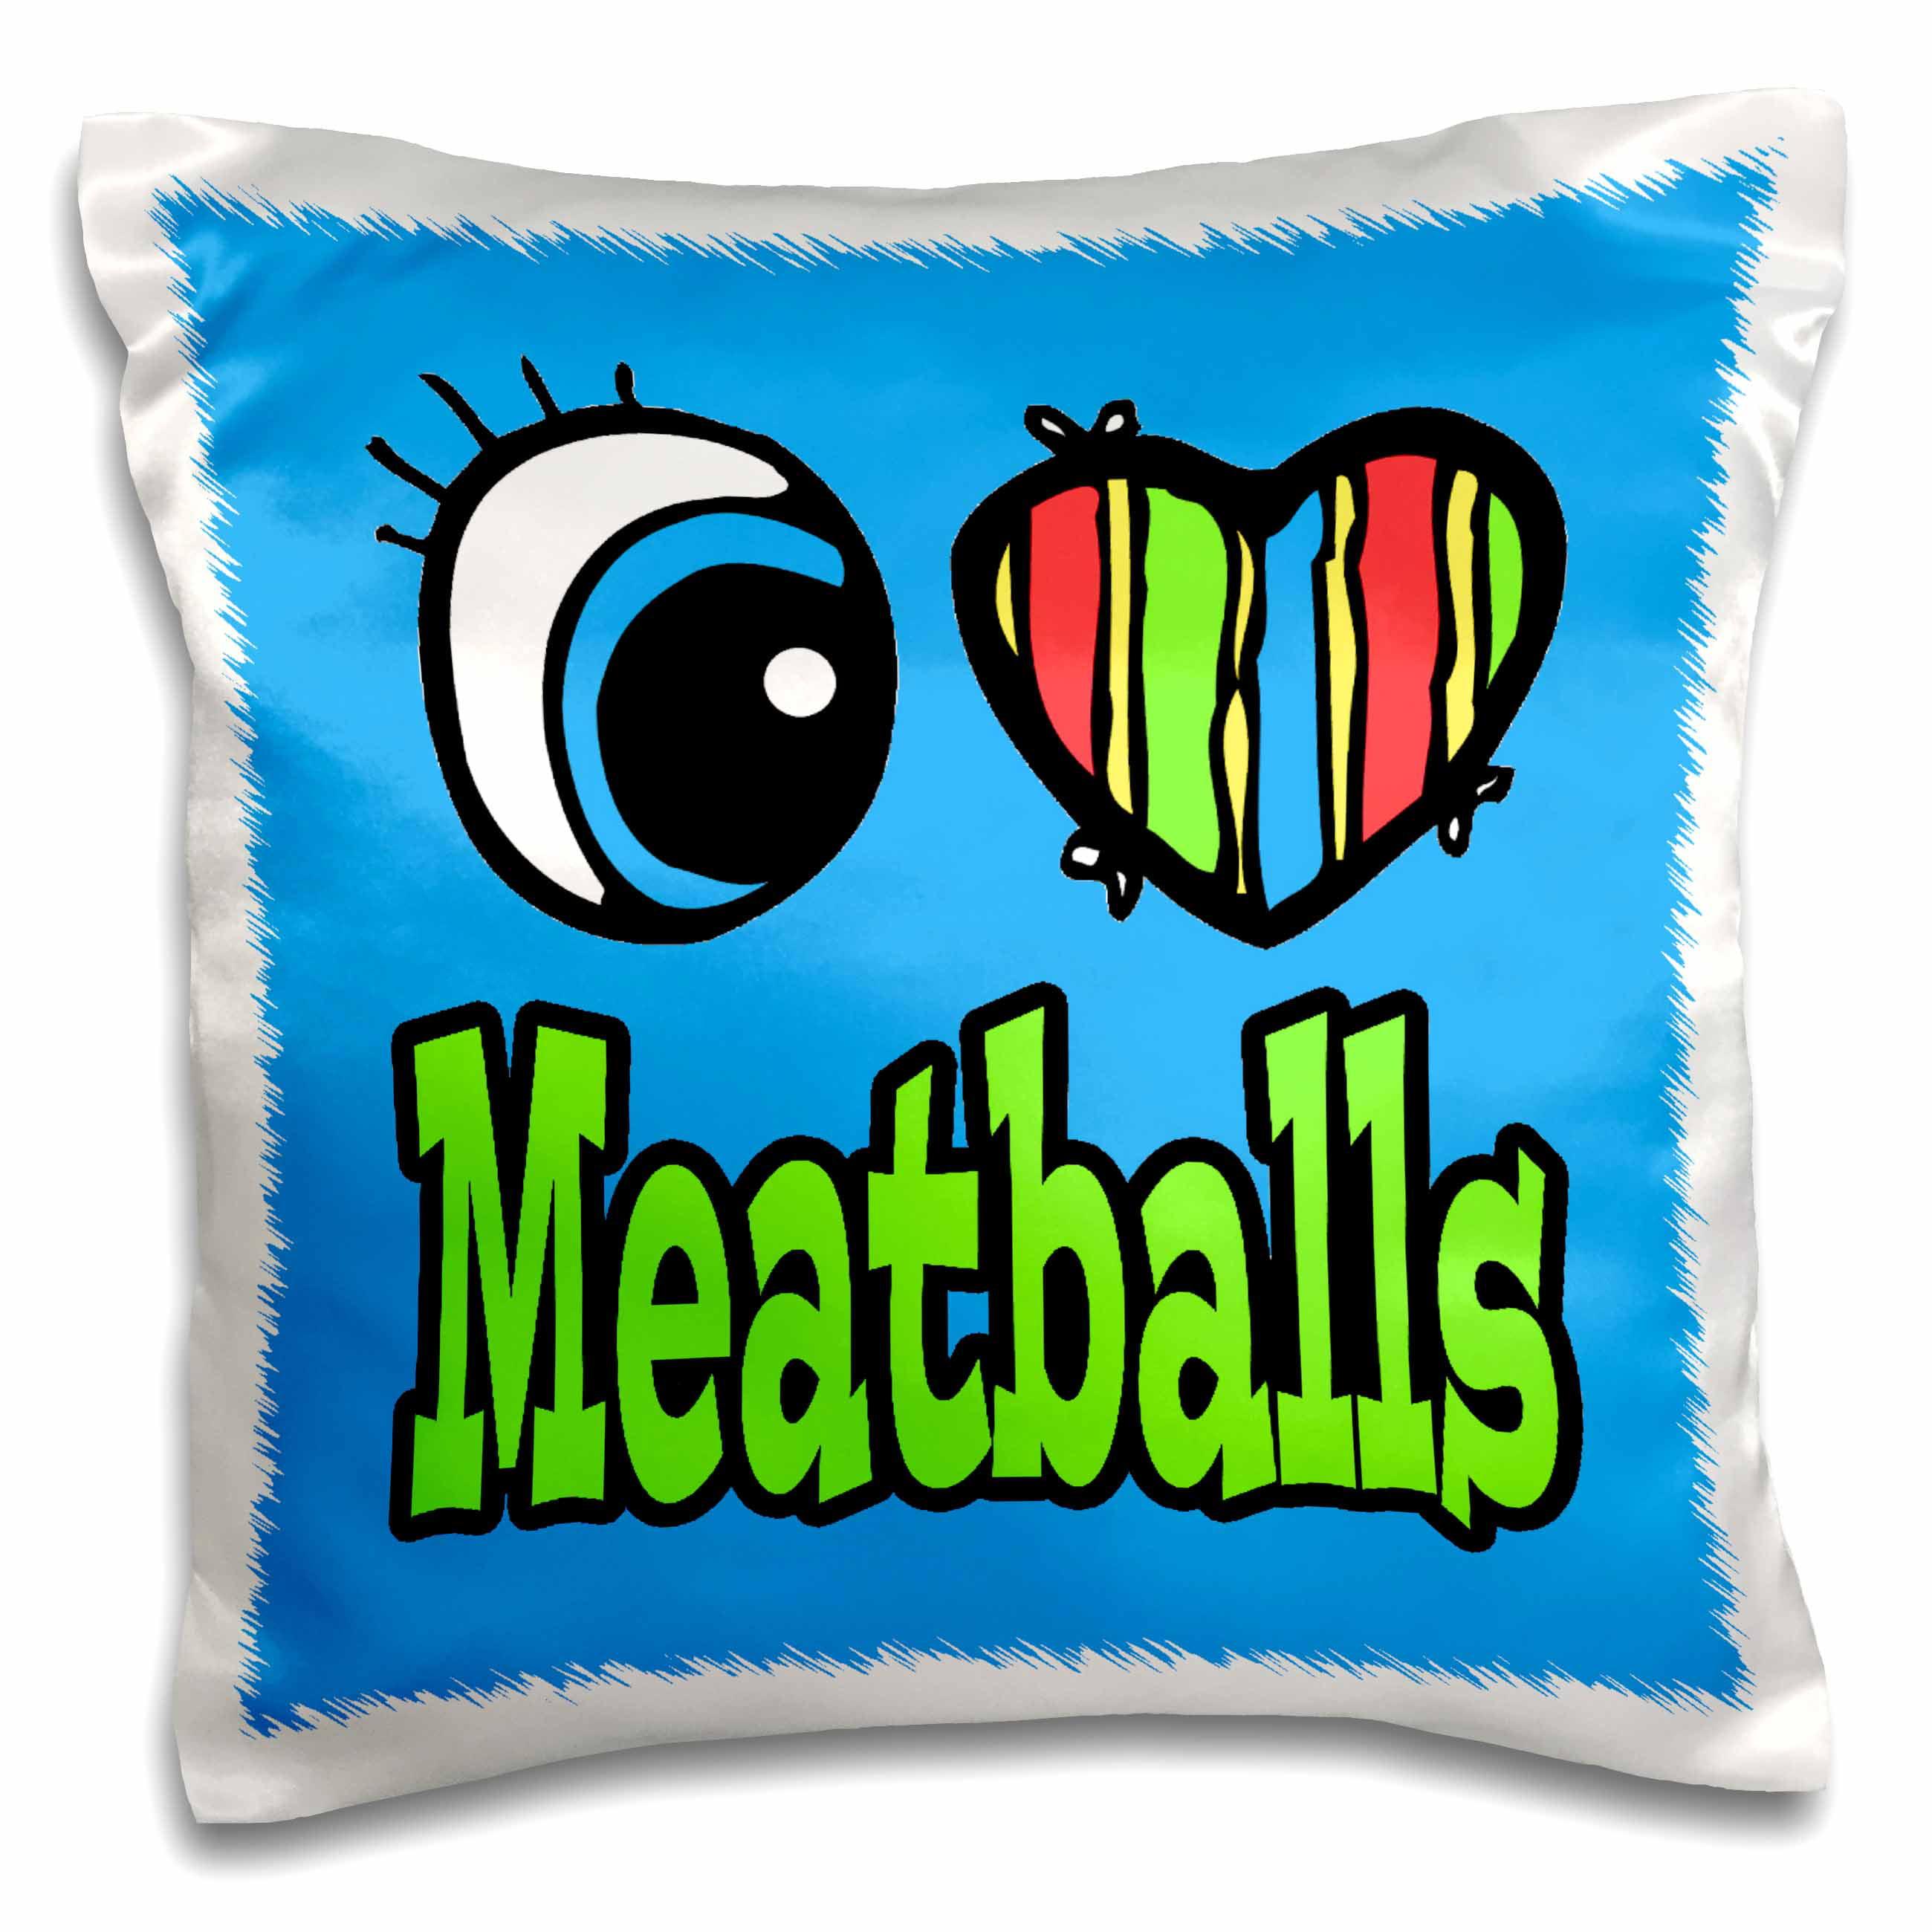 3dRose Bright Eye Heart I Love Meatballs - Pillow Case, 16 by 16-inch